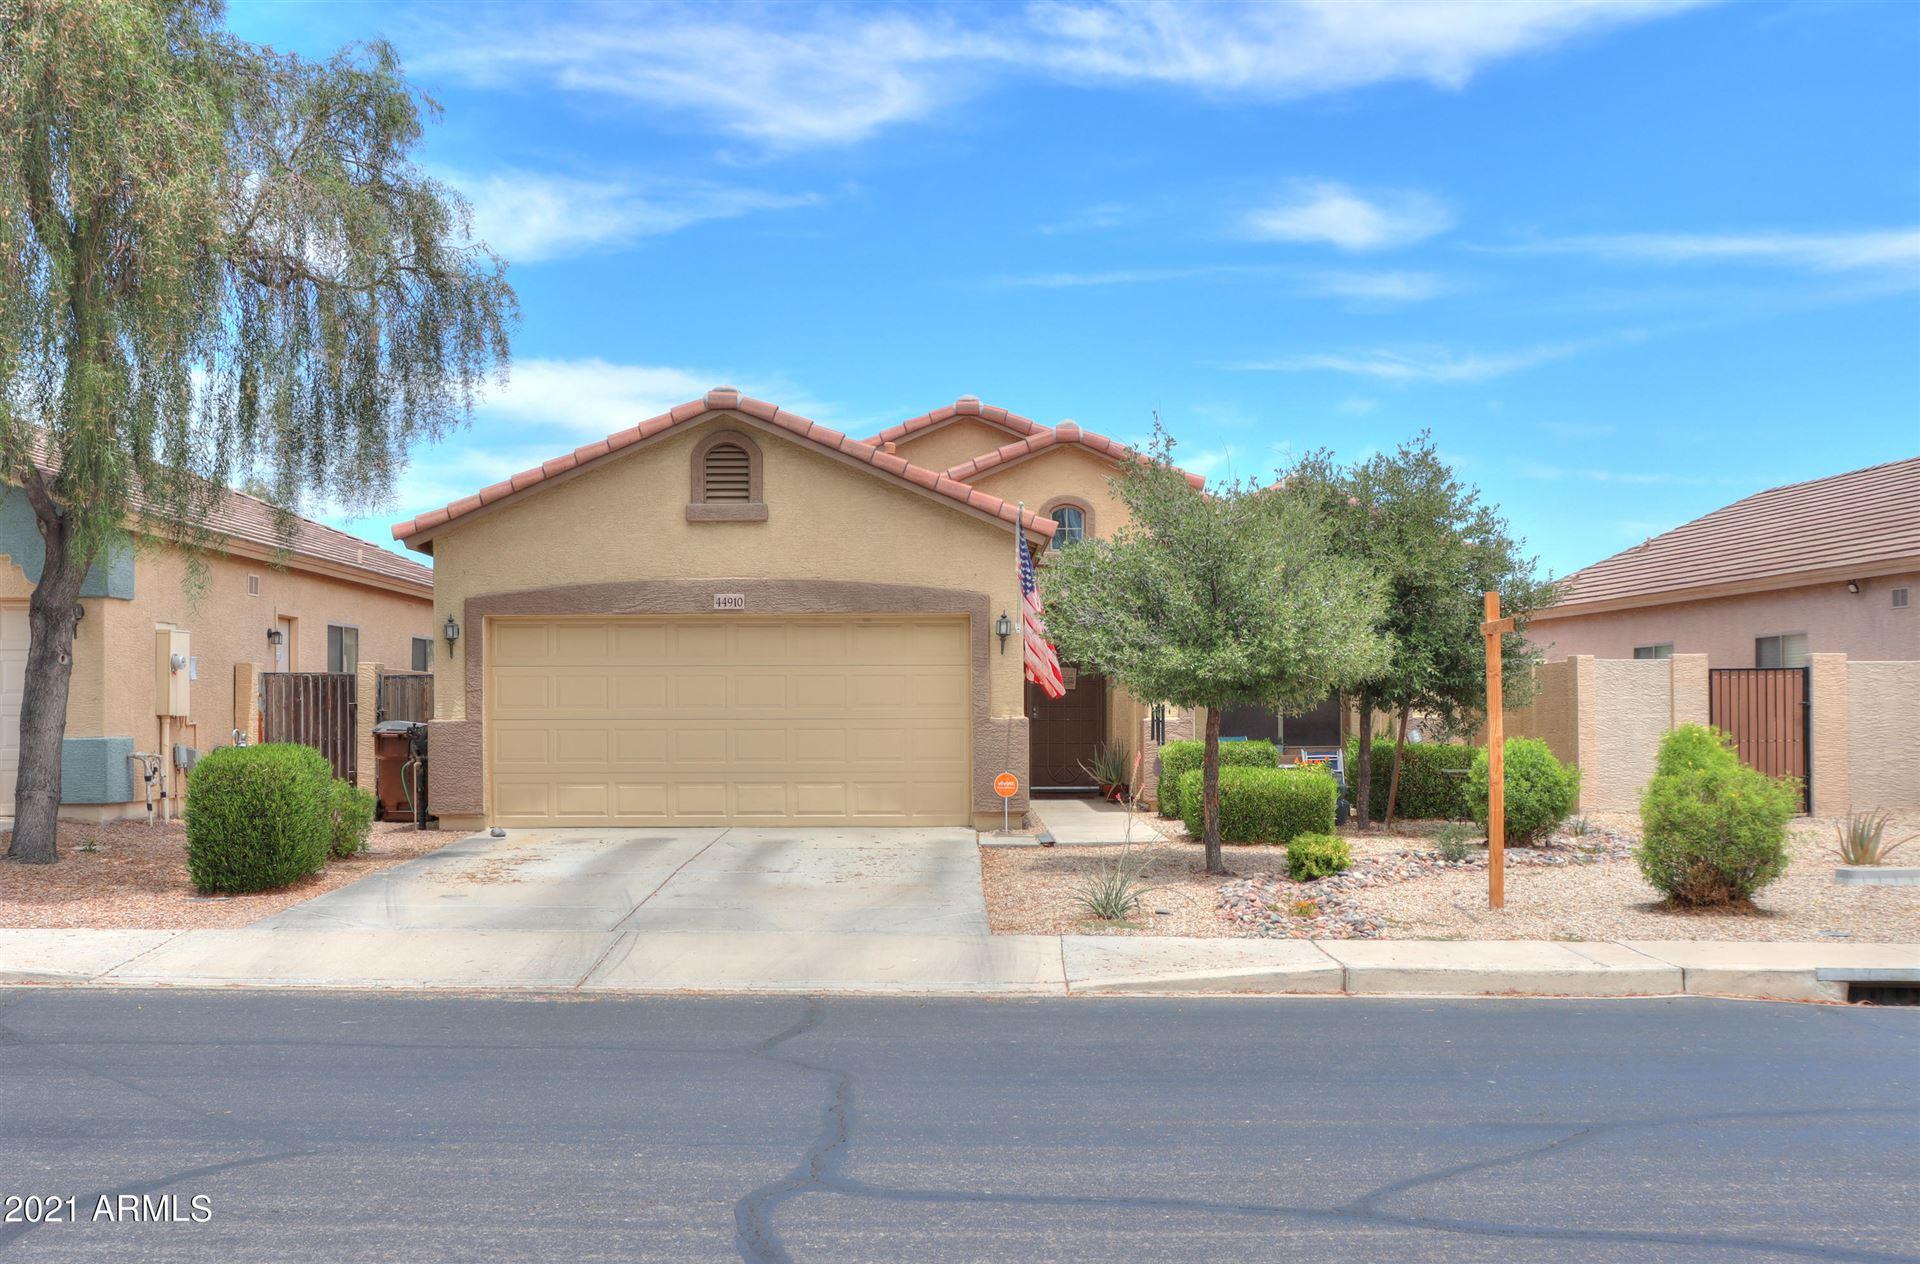 Photo for 44910 W ALAMENDRAS Street, Maricopa, AZ 85139 (MLS # 6247929)